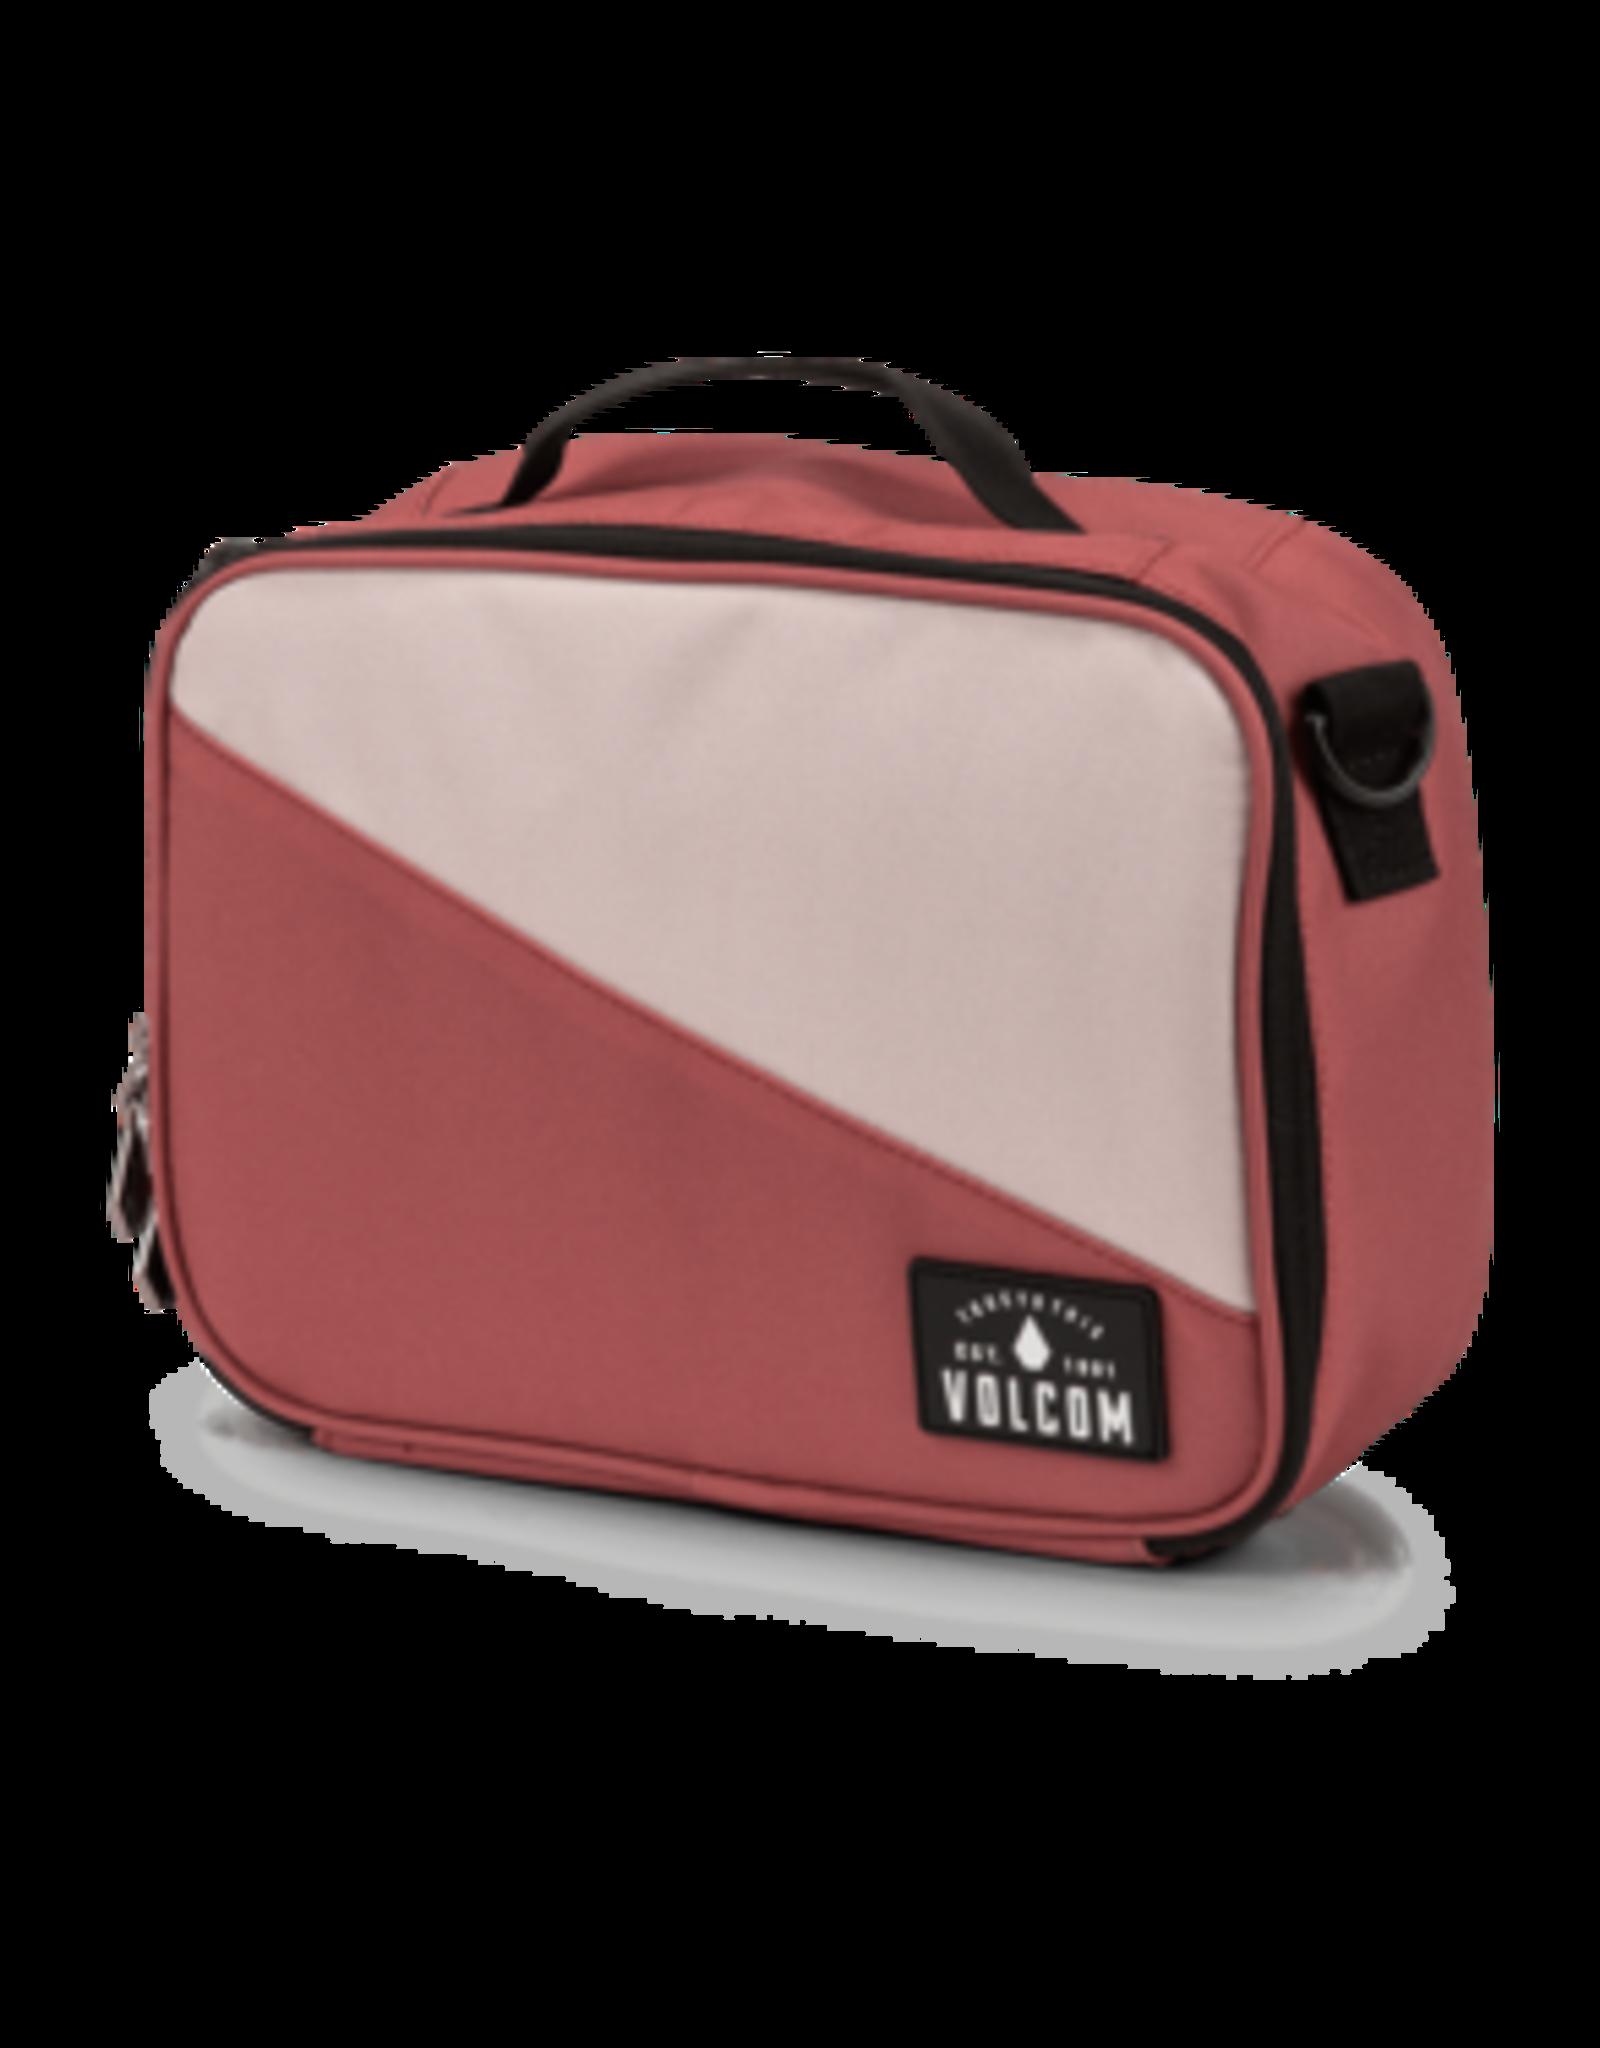 Volcom BROWN BAG LUNCH BOX DSR